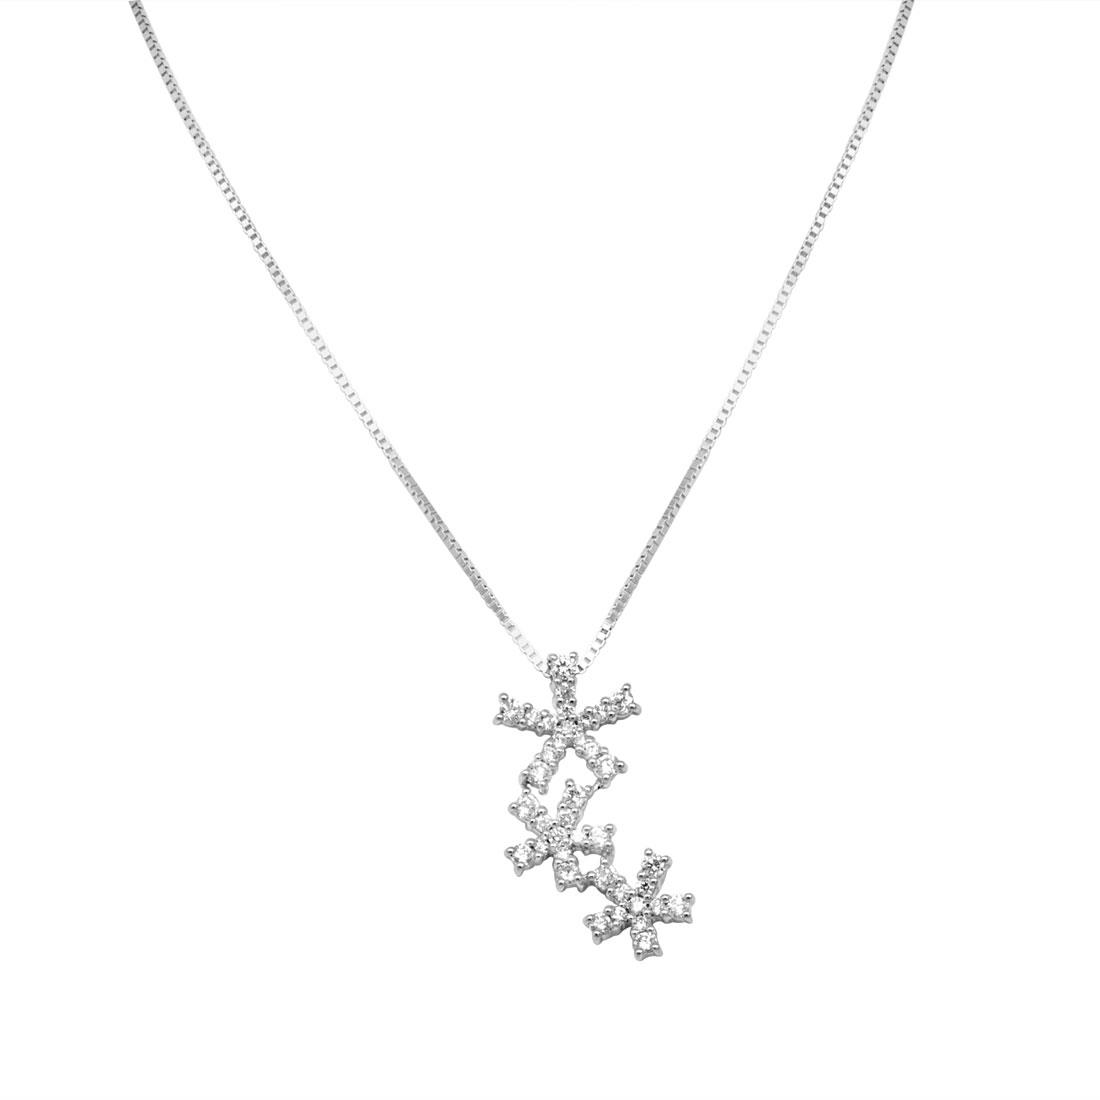 Collier Damiani in oro bianco con diamanti ct 0,84 - DAMIANI